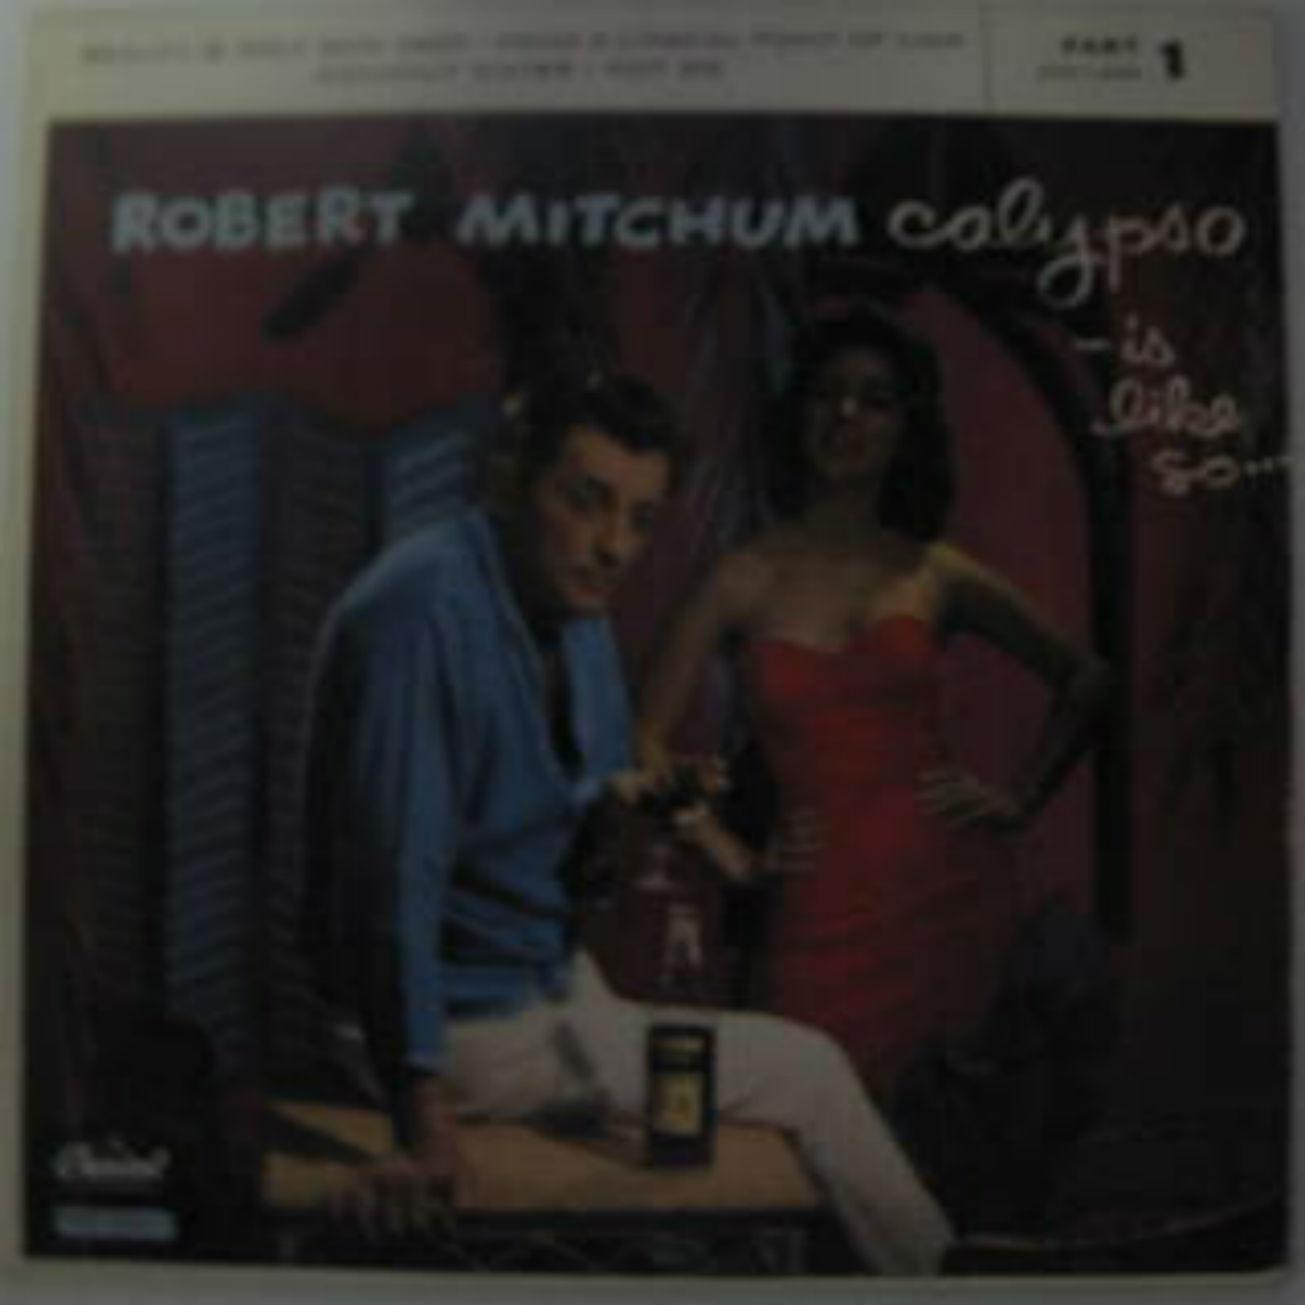 Robert Mitchum / Calypso- Is Like So…EP Part 1-3